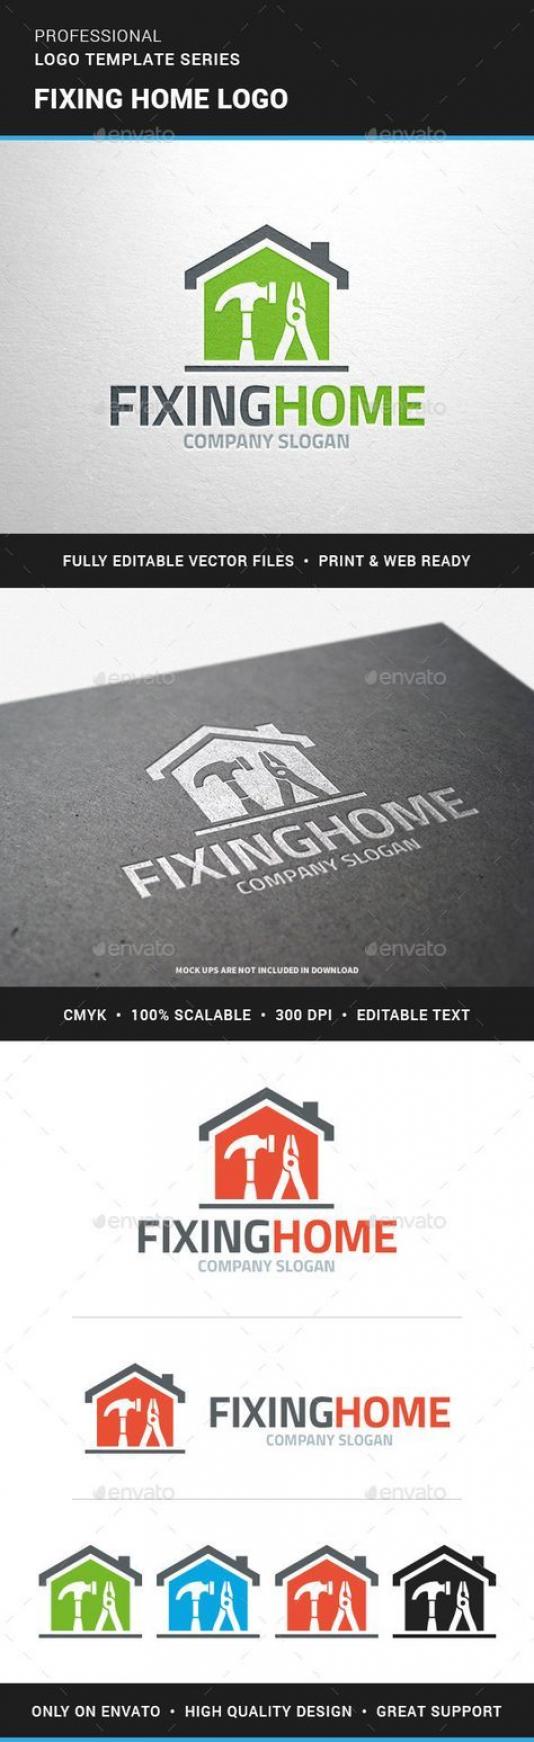 homemaintenance home maintenance logo in 2020 Home